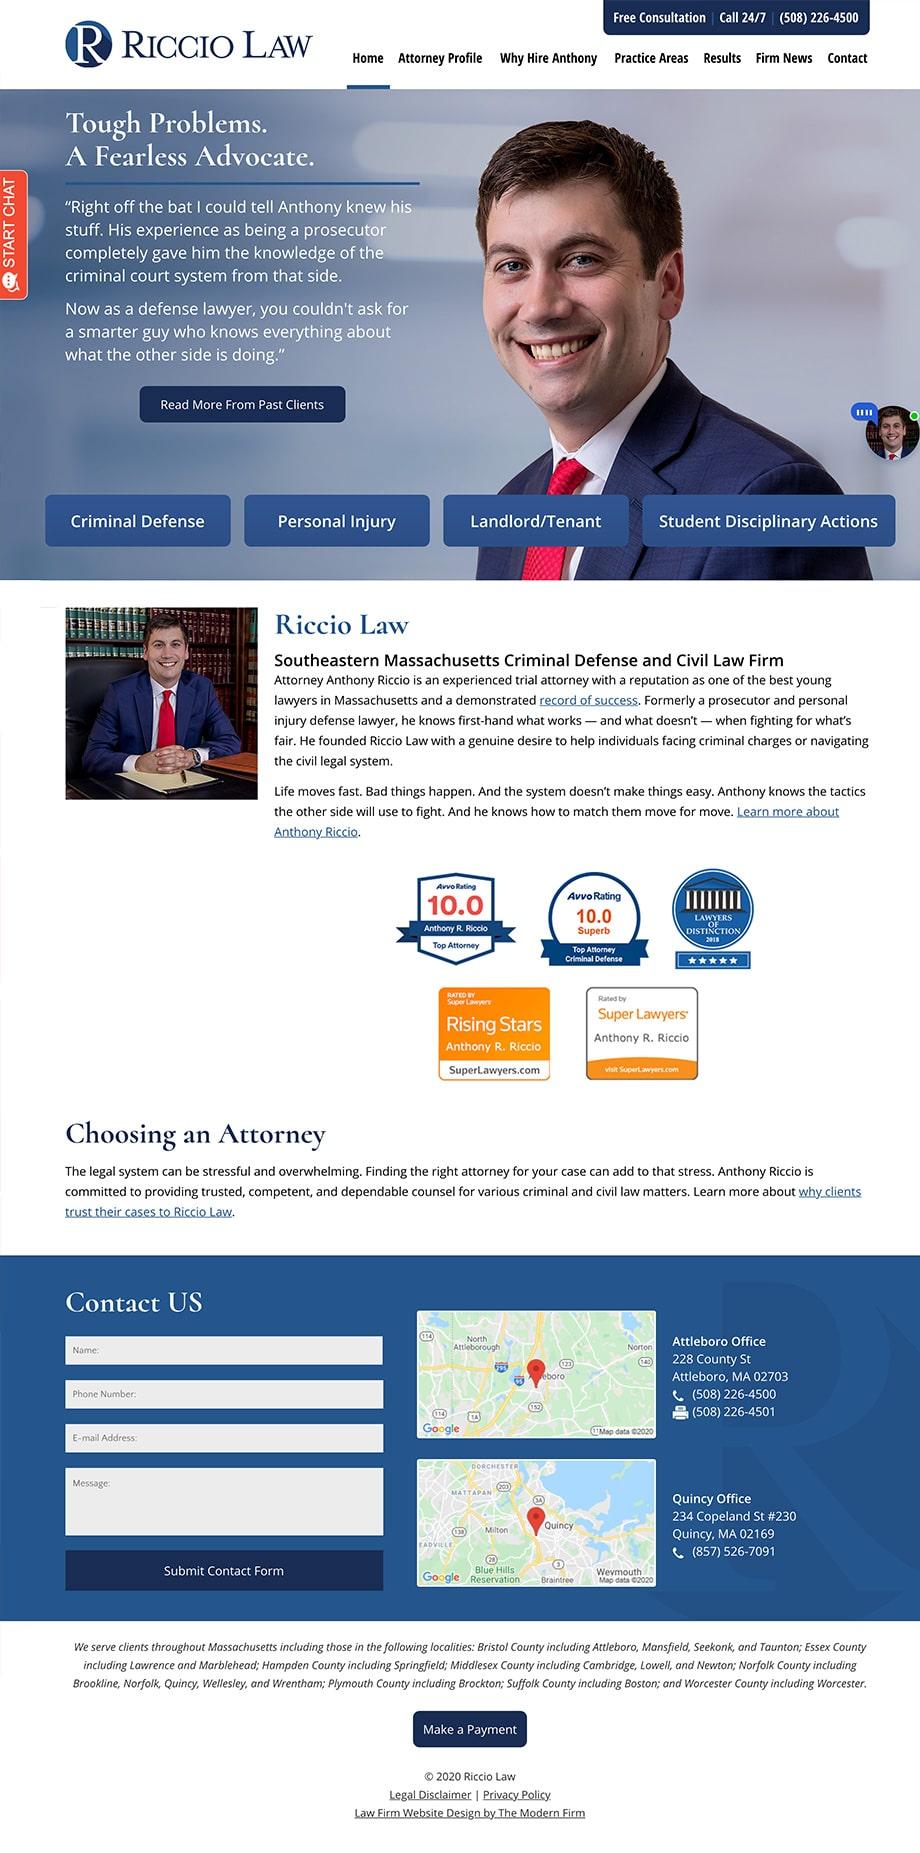 Law Firm Website Design for Riccio Law